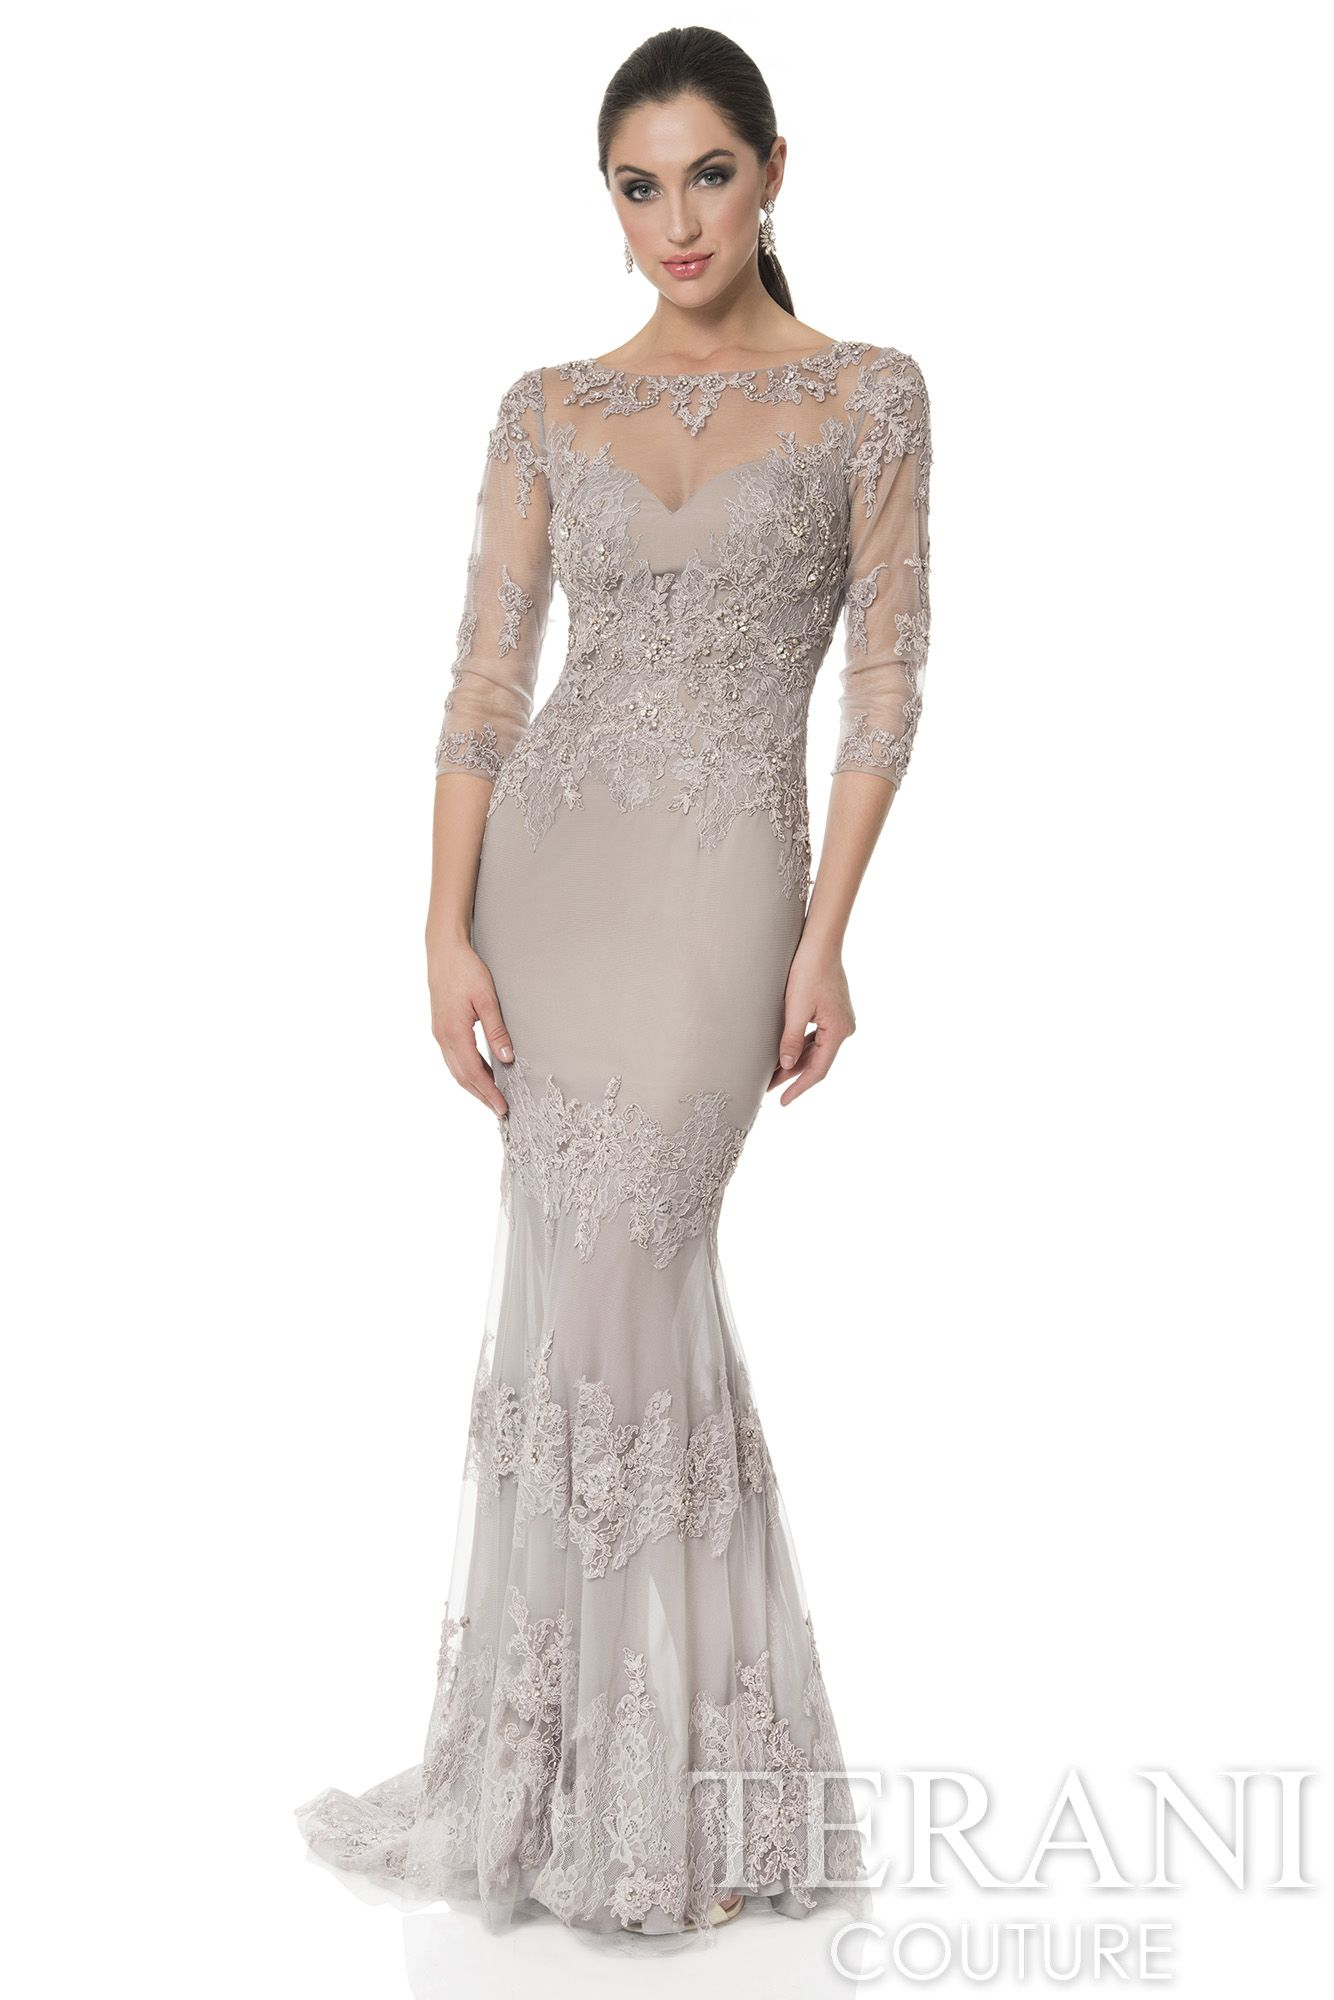 Terani couture 2016 prom dresses evening dresses for Terani couture wedding dress